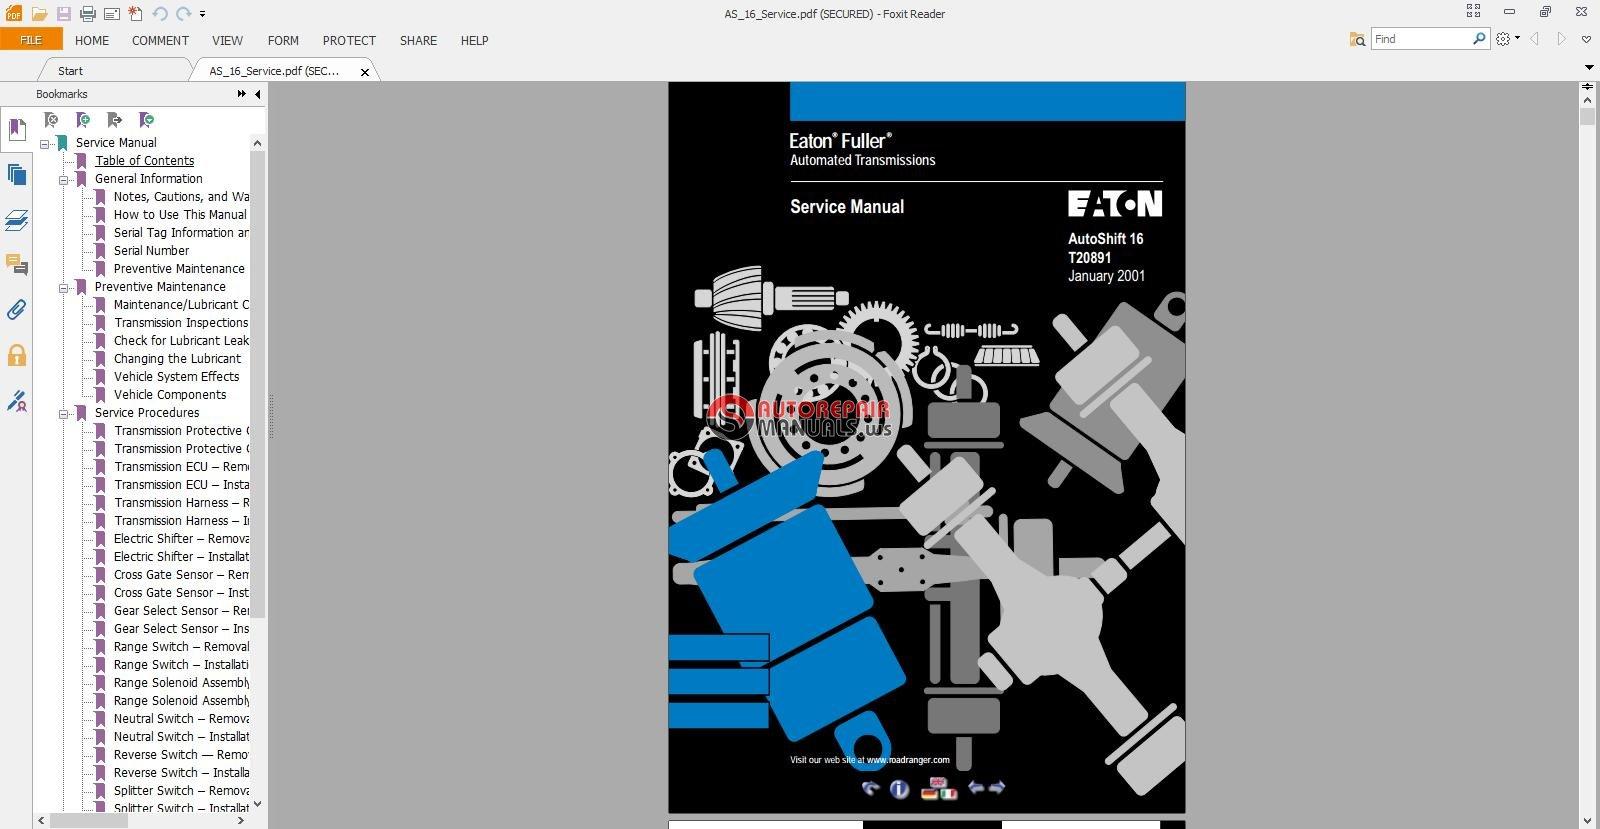 eaton fuller transmission service manual